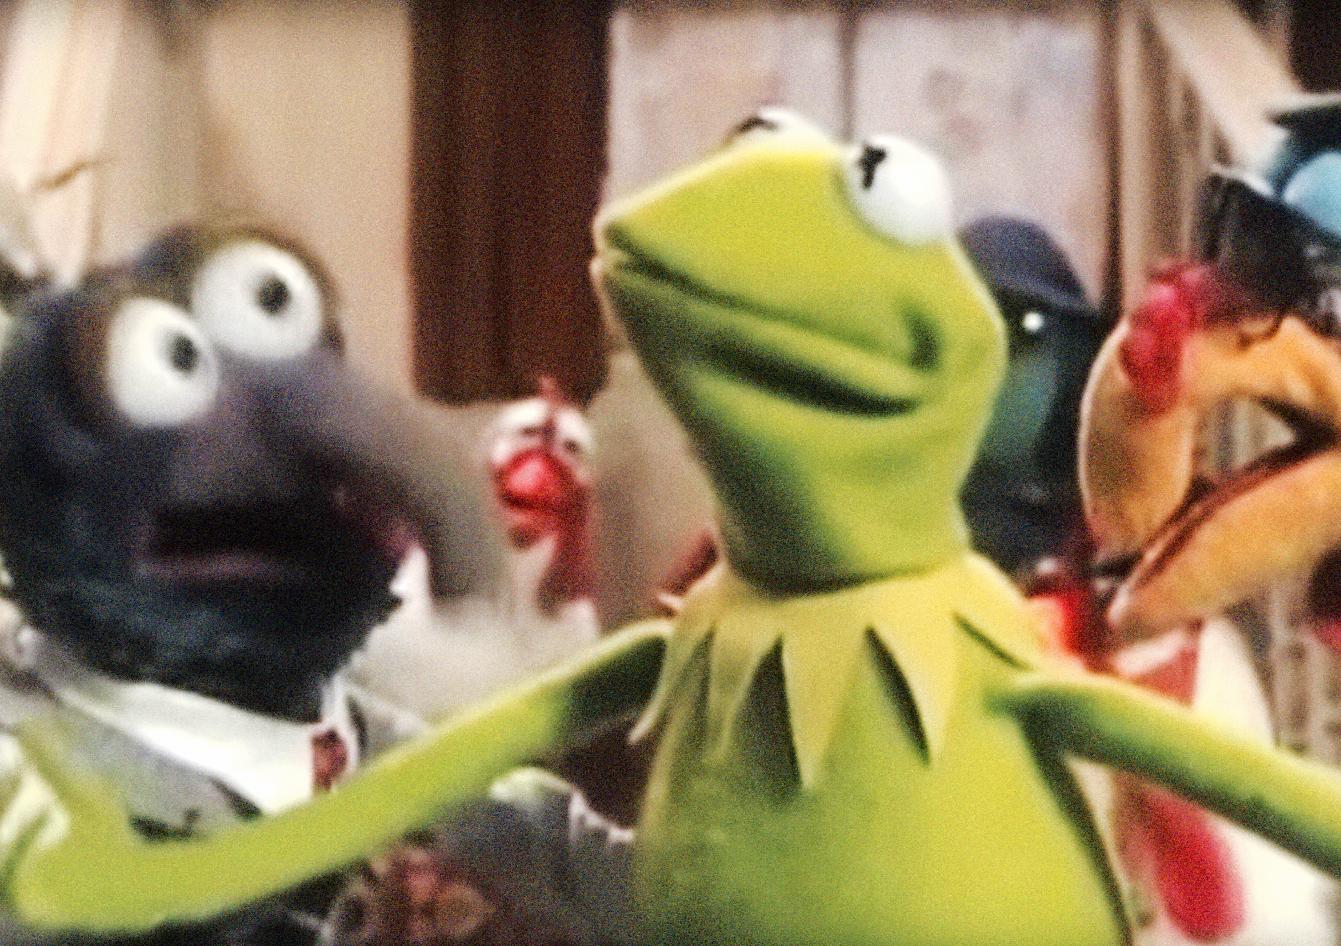 Outkast Ms. jackson in der Mylo The Cat Muppets Version als Musikvideo umgesetzt